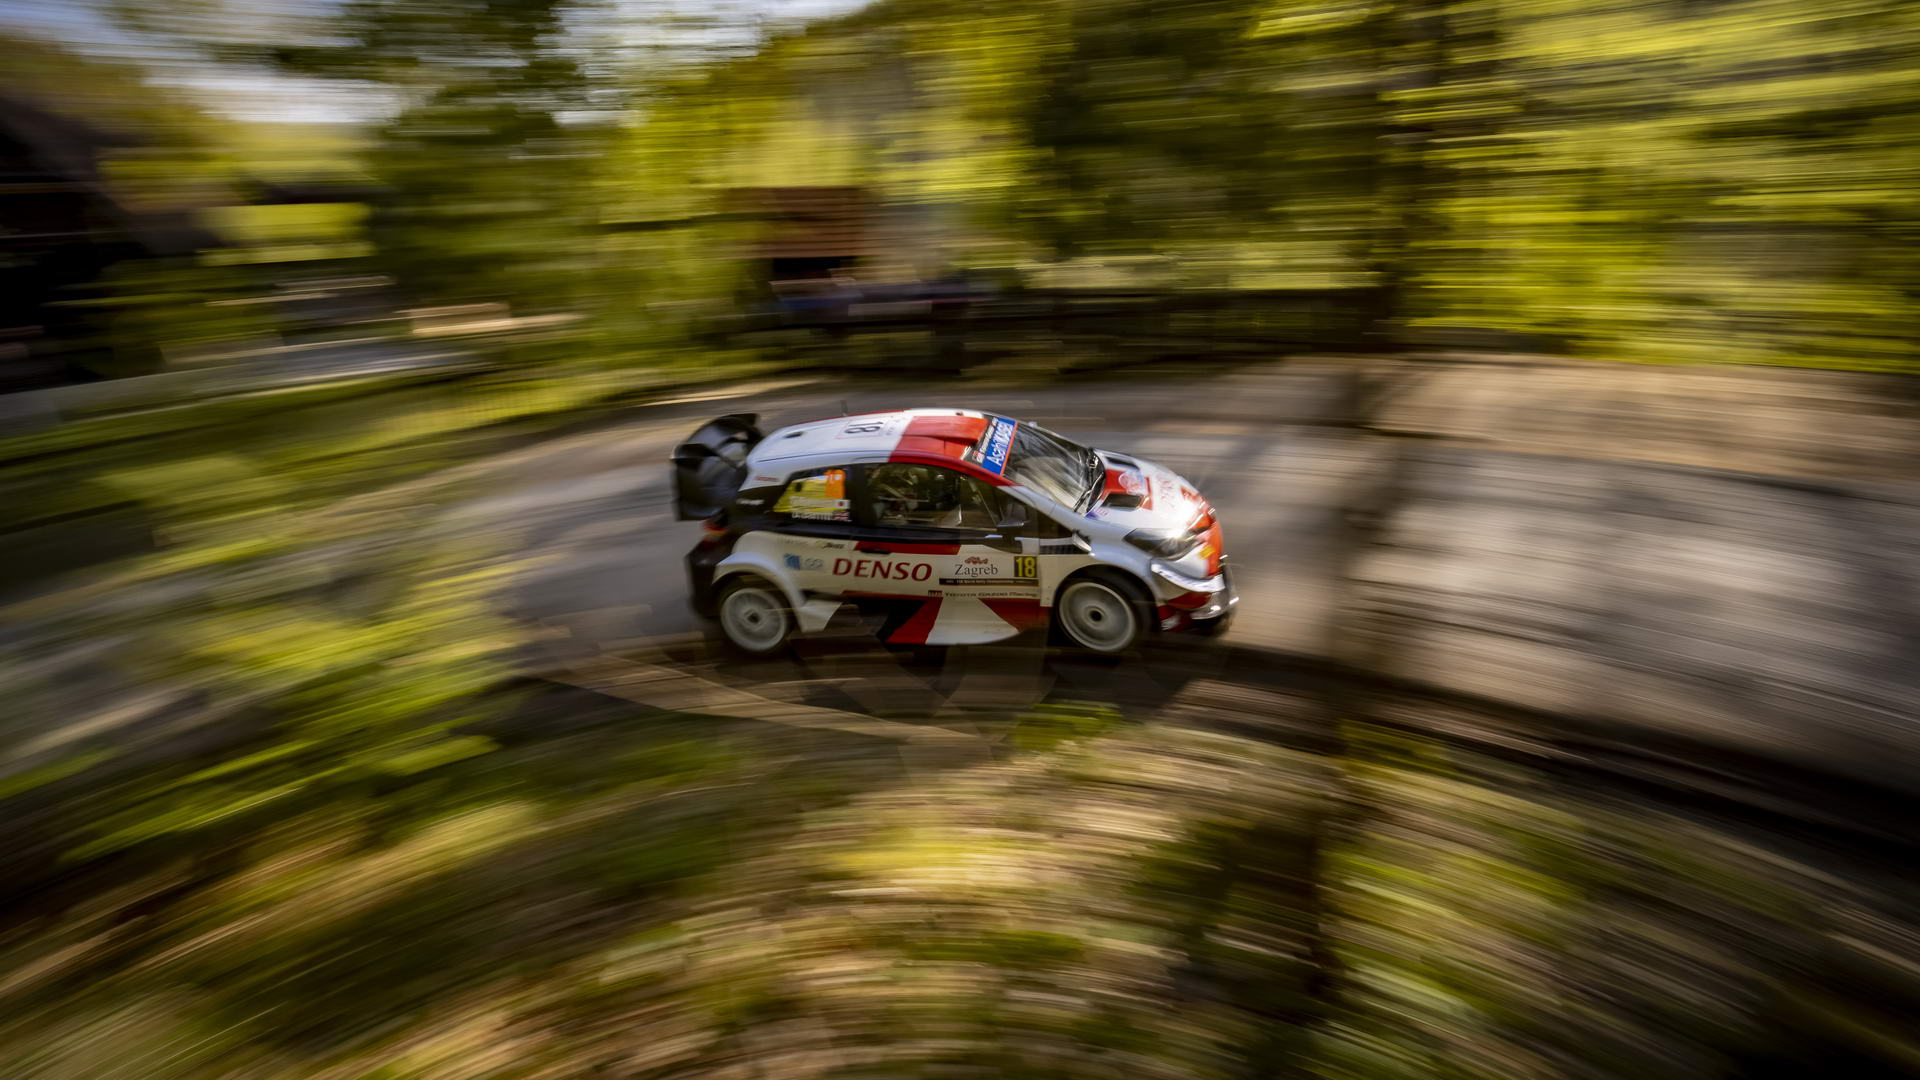 Croatia Rally - Takamoto Katsuta